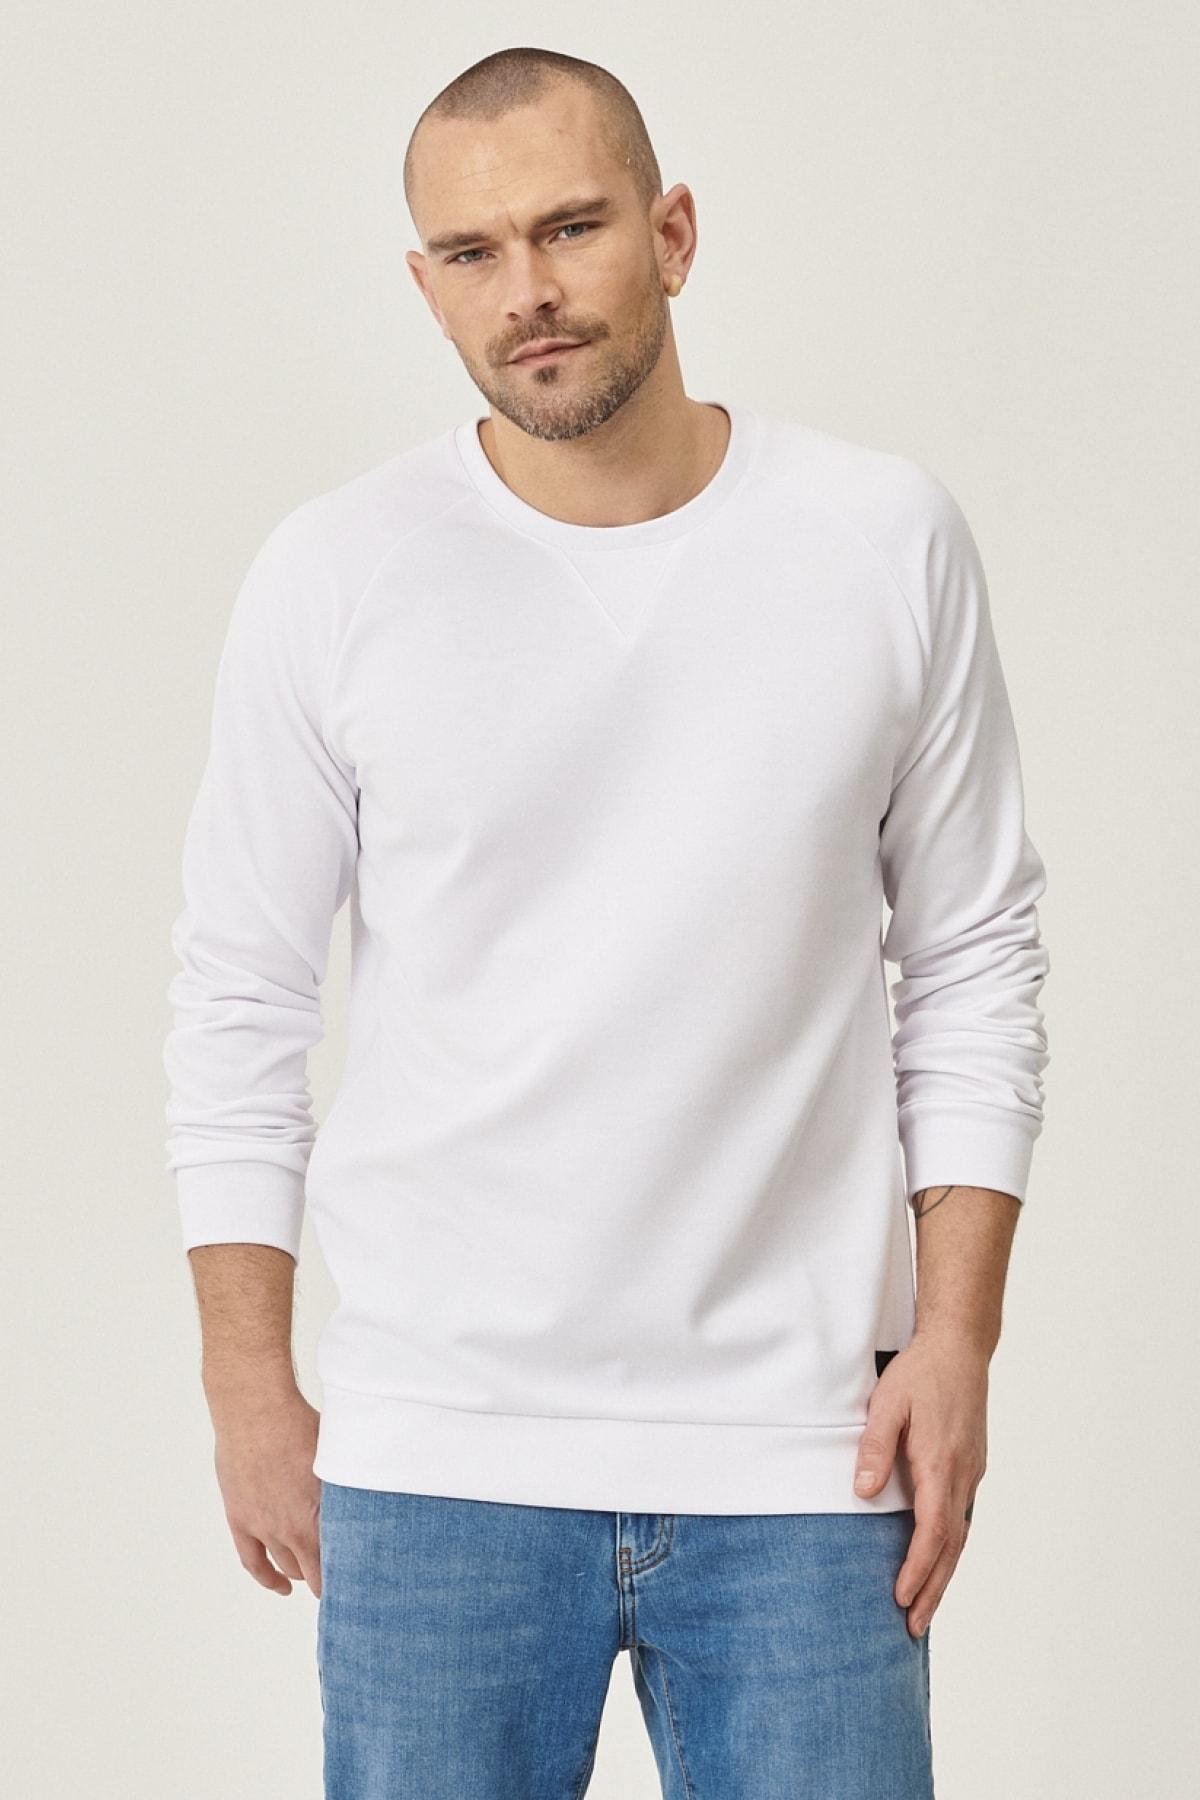 Erkek Beyaz Standart Fit Günlük Rahat Bisiklet Yaka Spor Sweatshirt